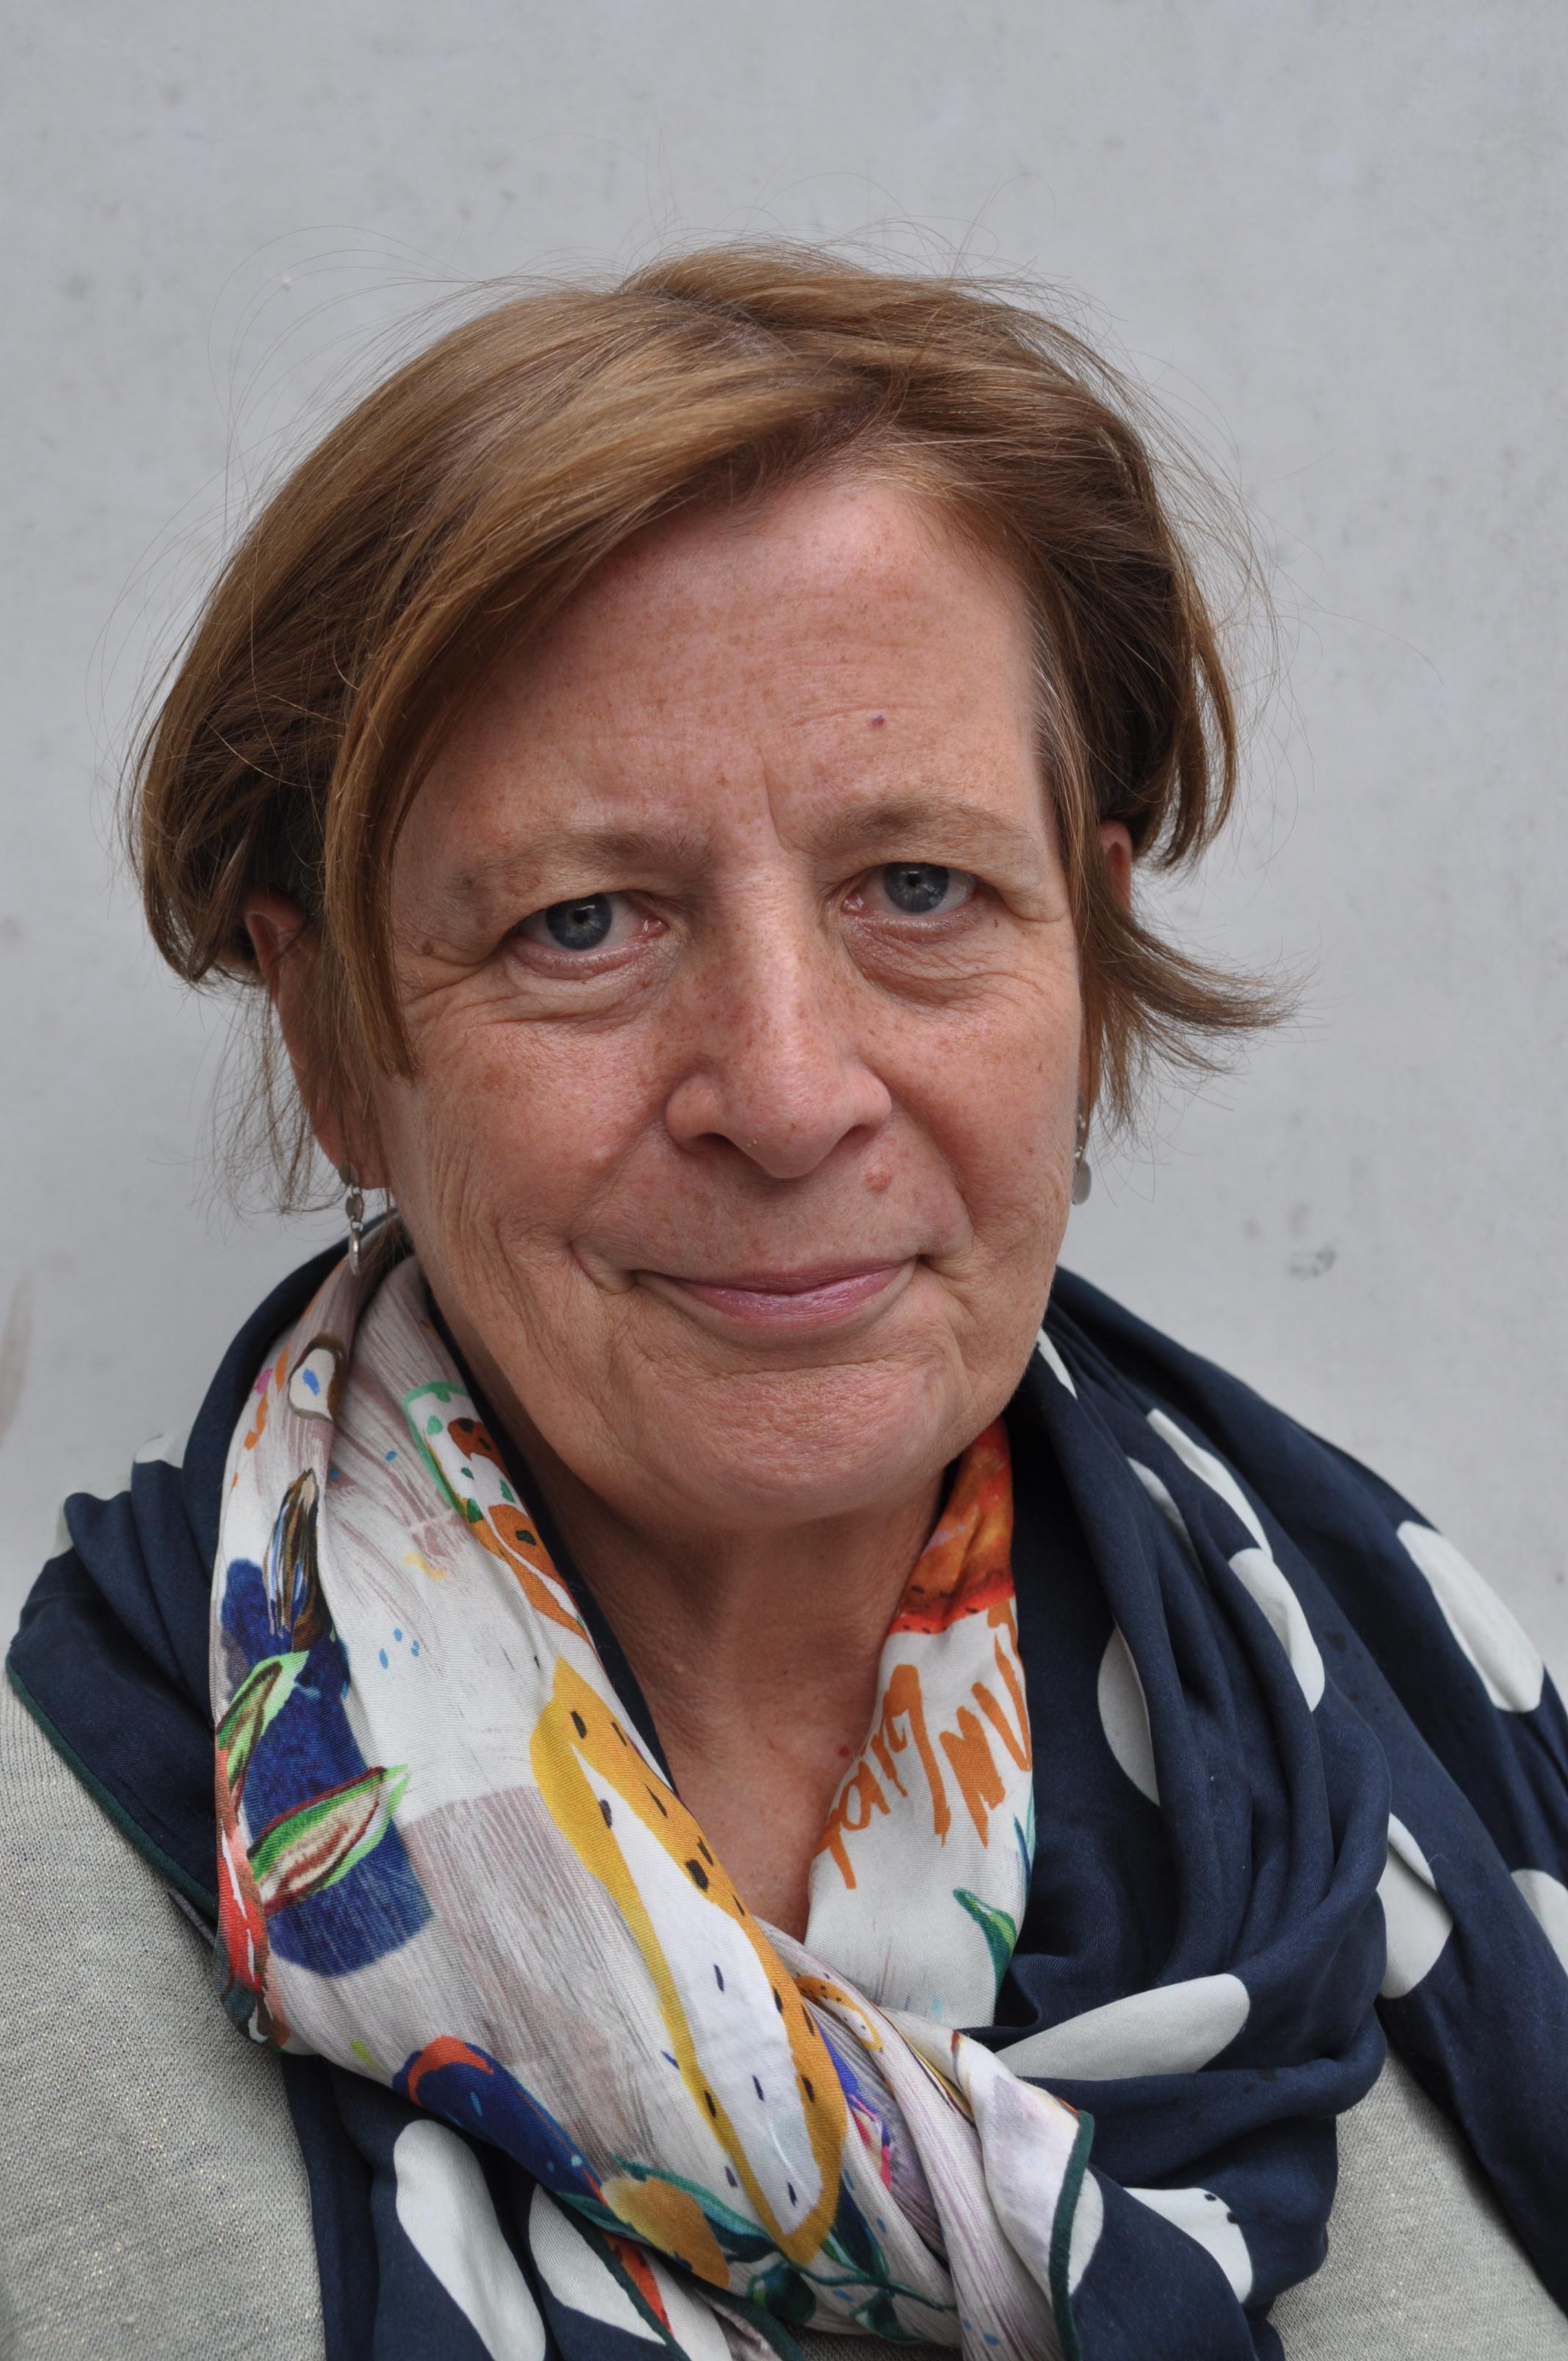 Marleen Roelants